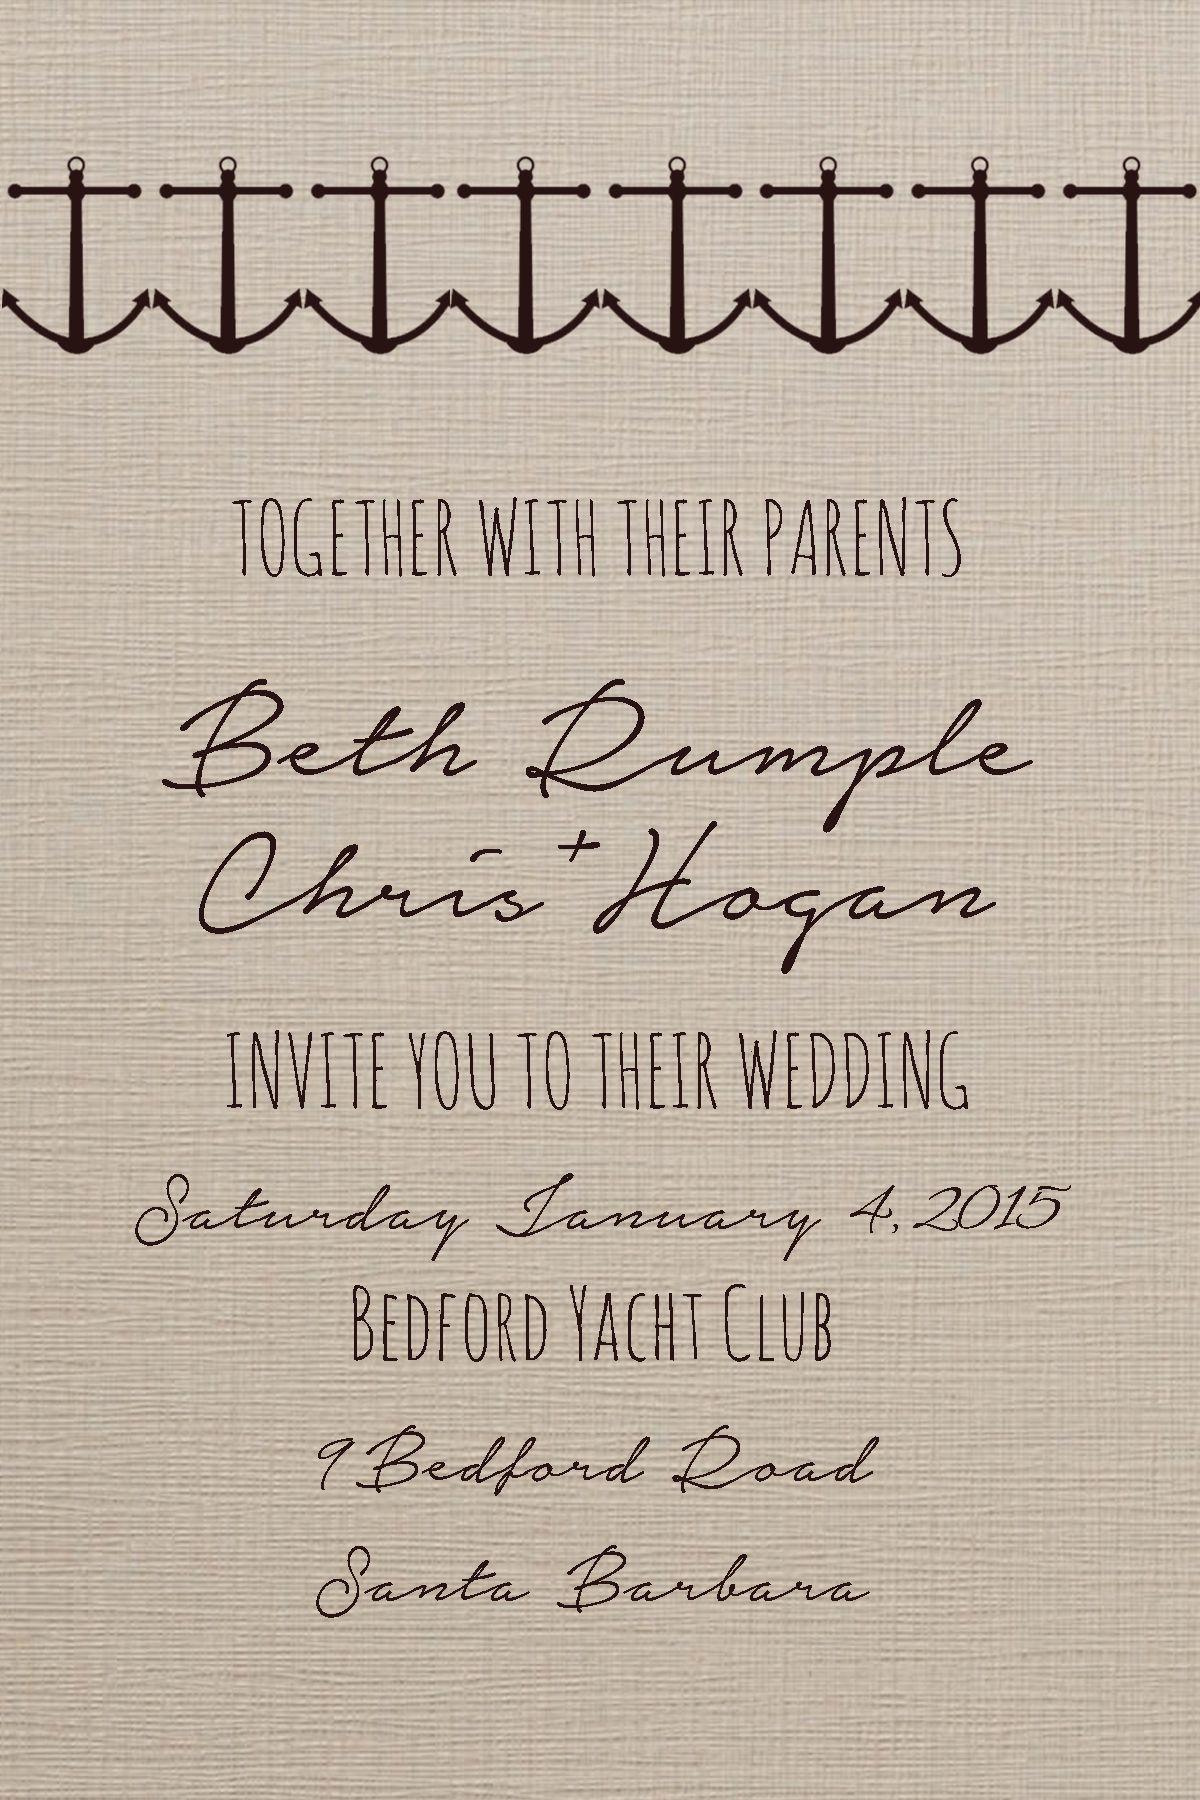 Nautical Wedding Invitation. Fonts Used- Amatic and Notera. | typo ...